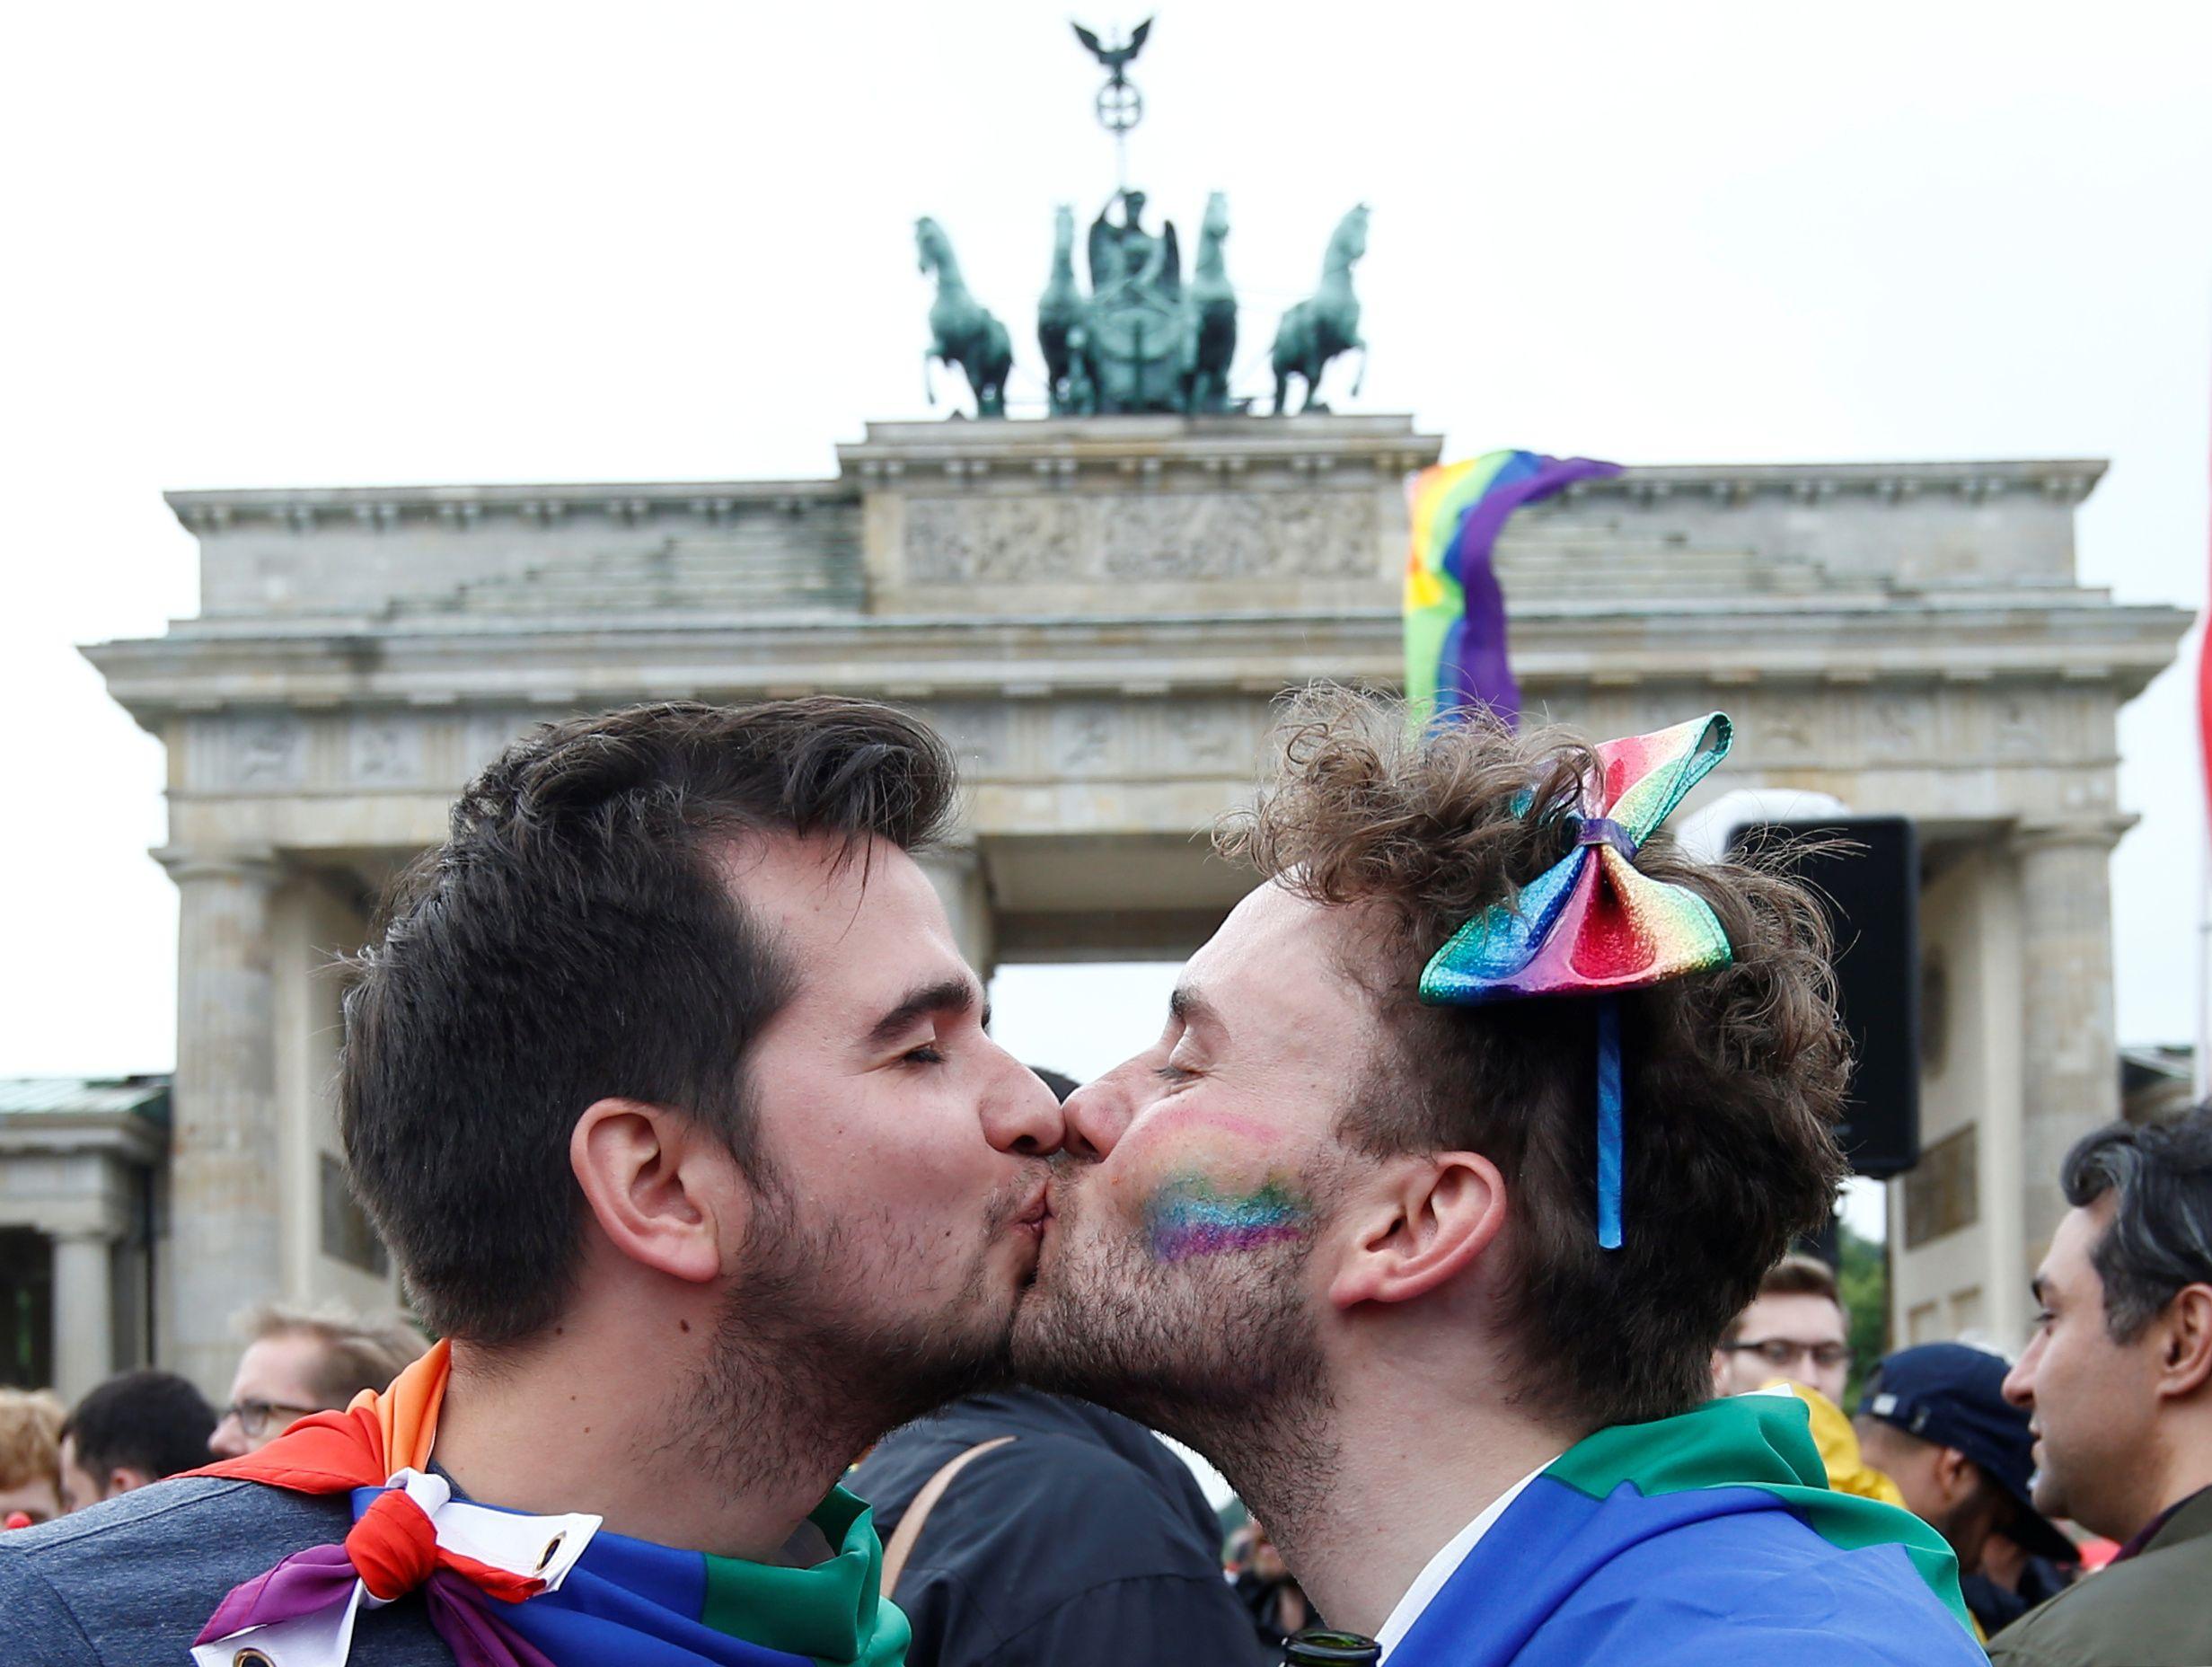 Christian heterosexual civil union